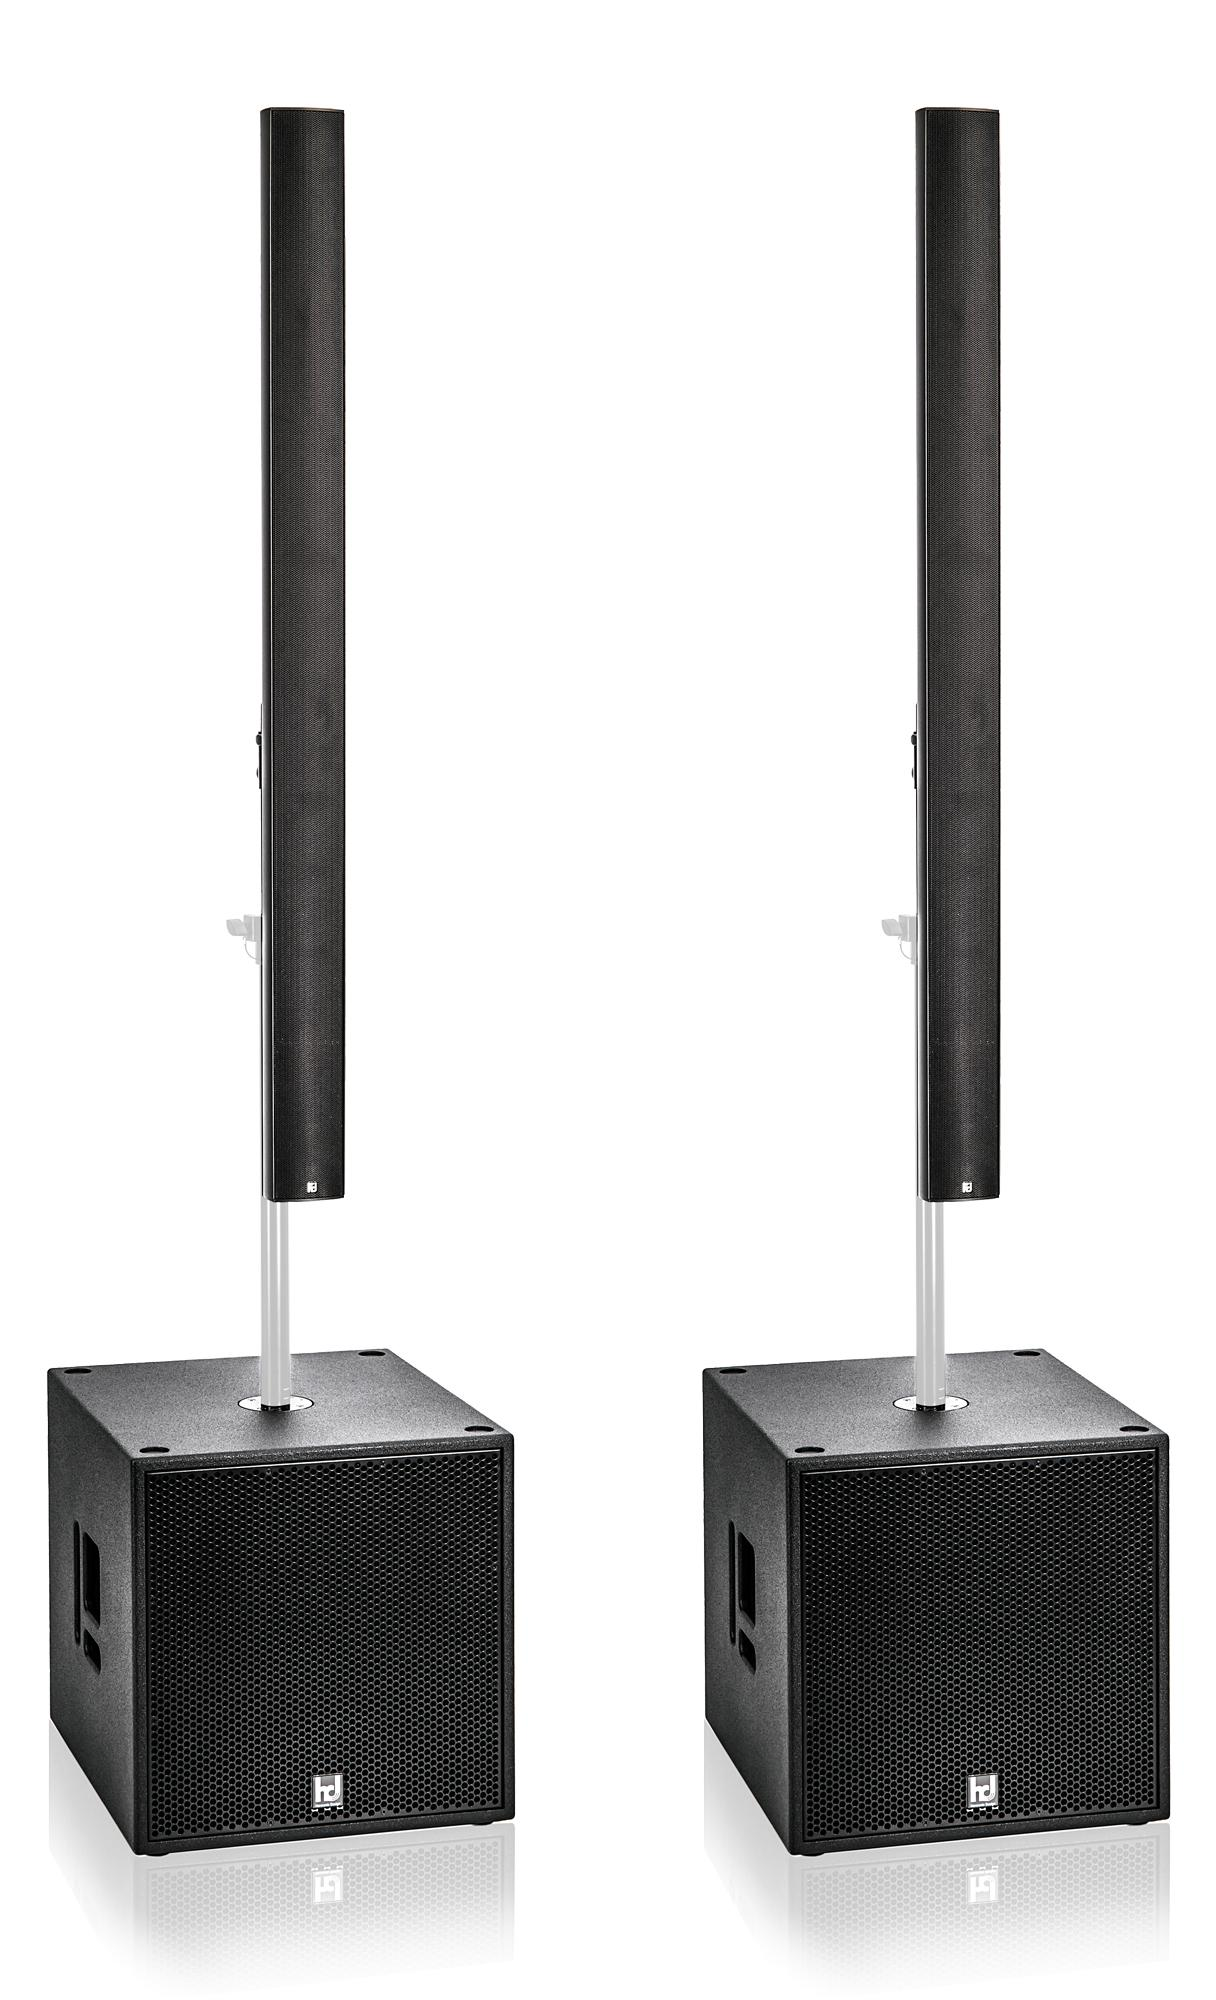 Harmonic Design PL12|P18 PA1 Multi DSP Aktivsystem 3700 Watt